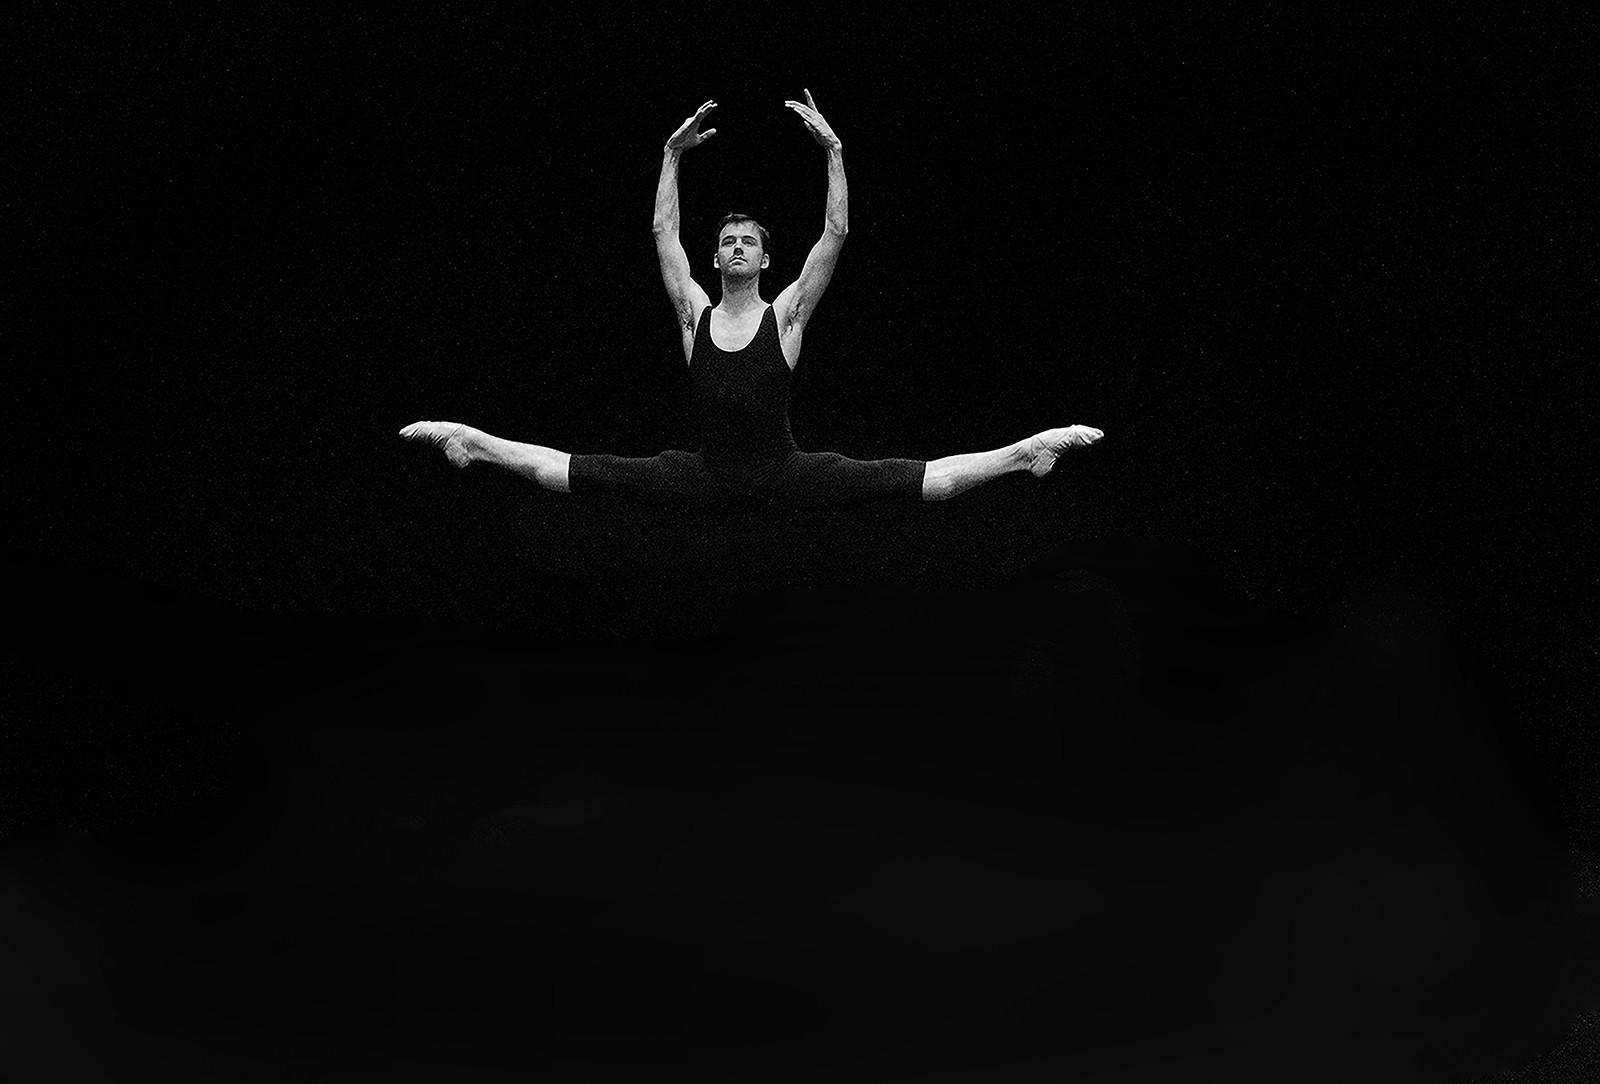 MONO - The Dancer by Paul Irwin (9 marks)